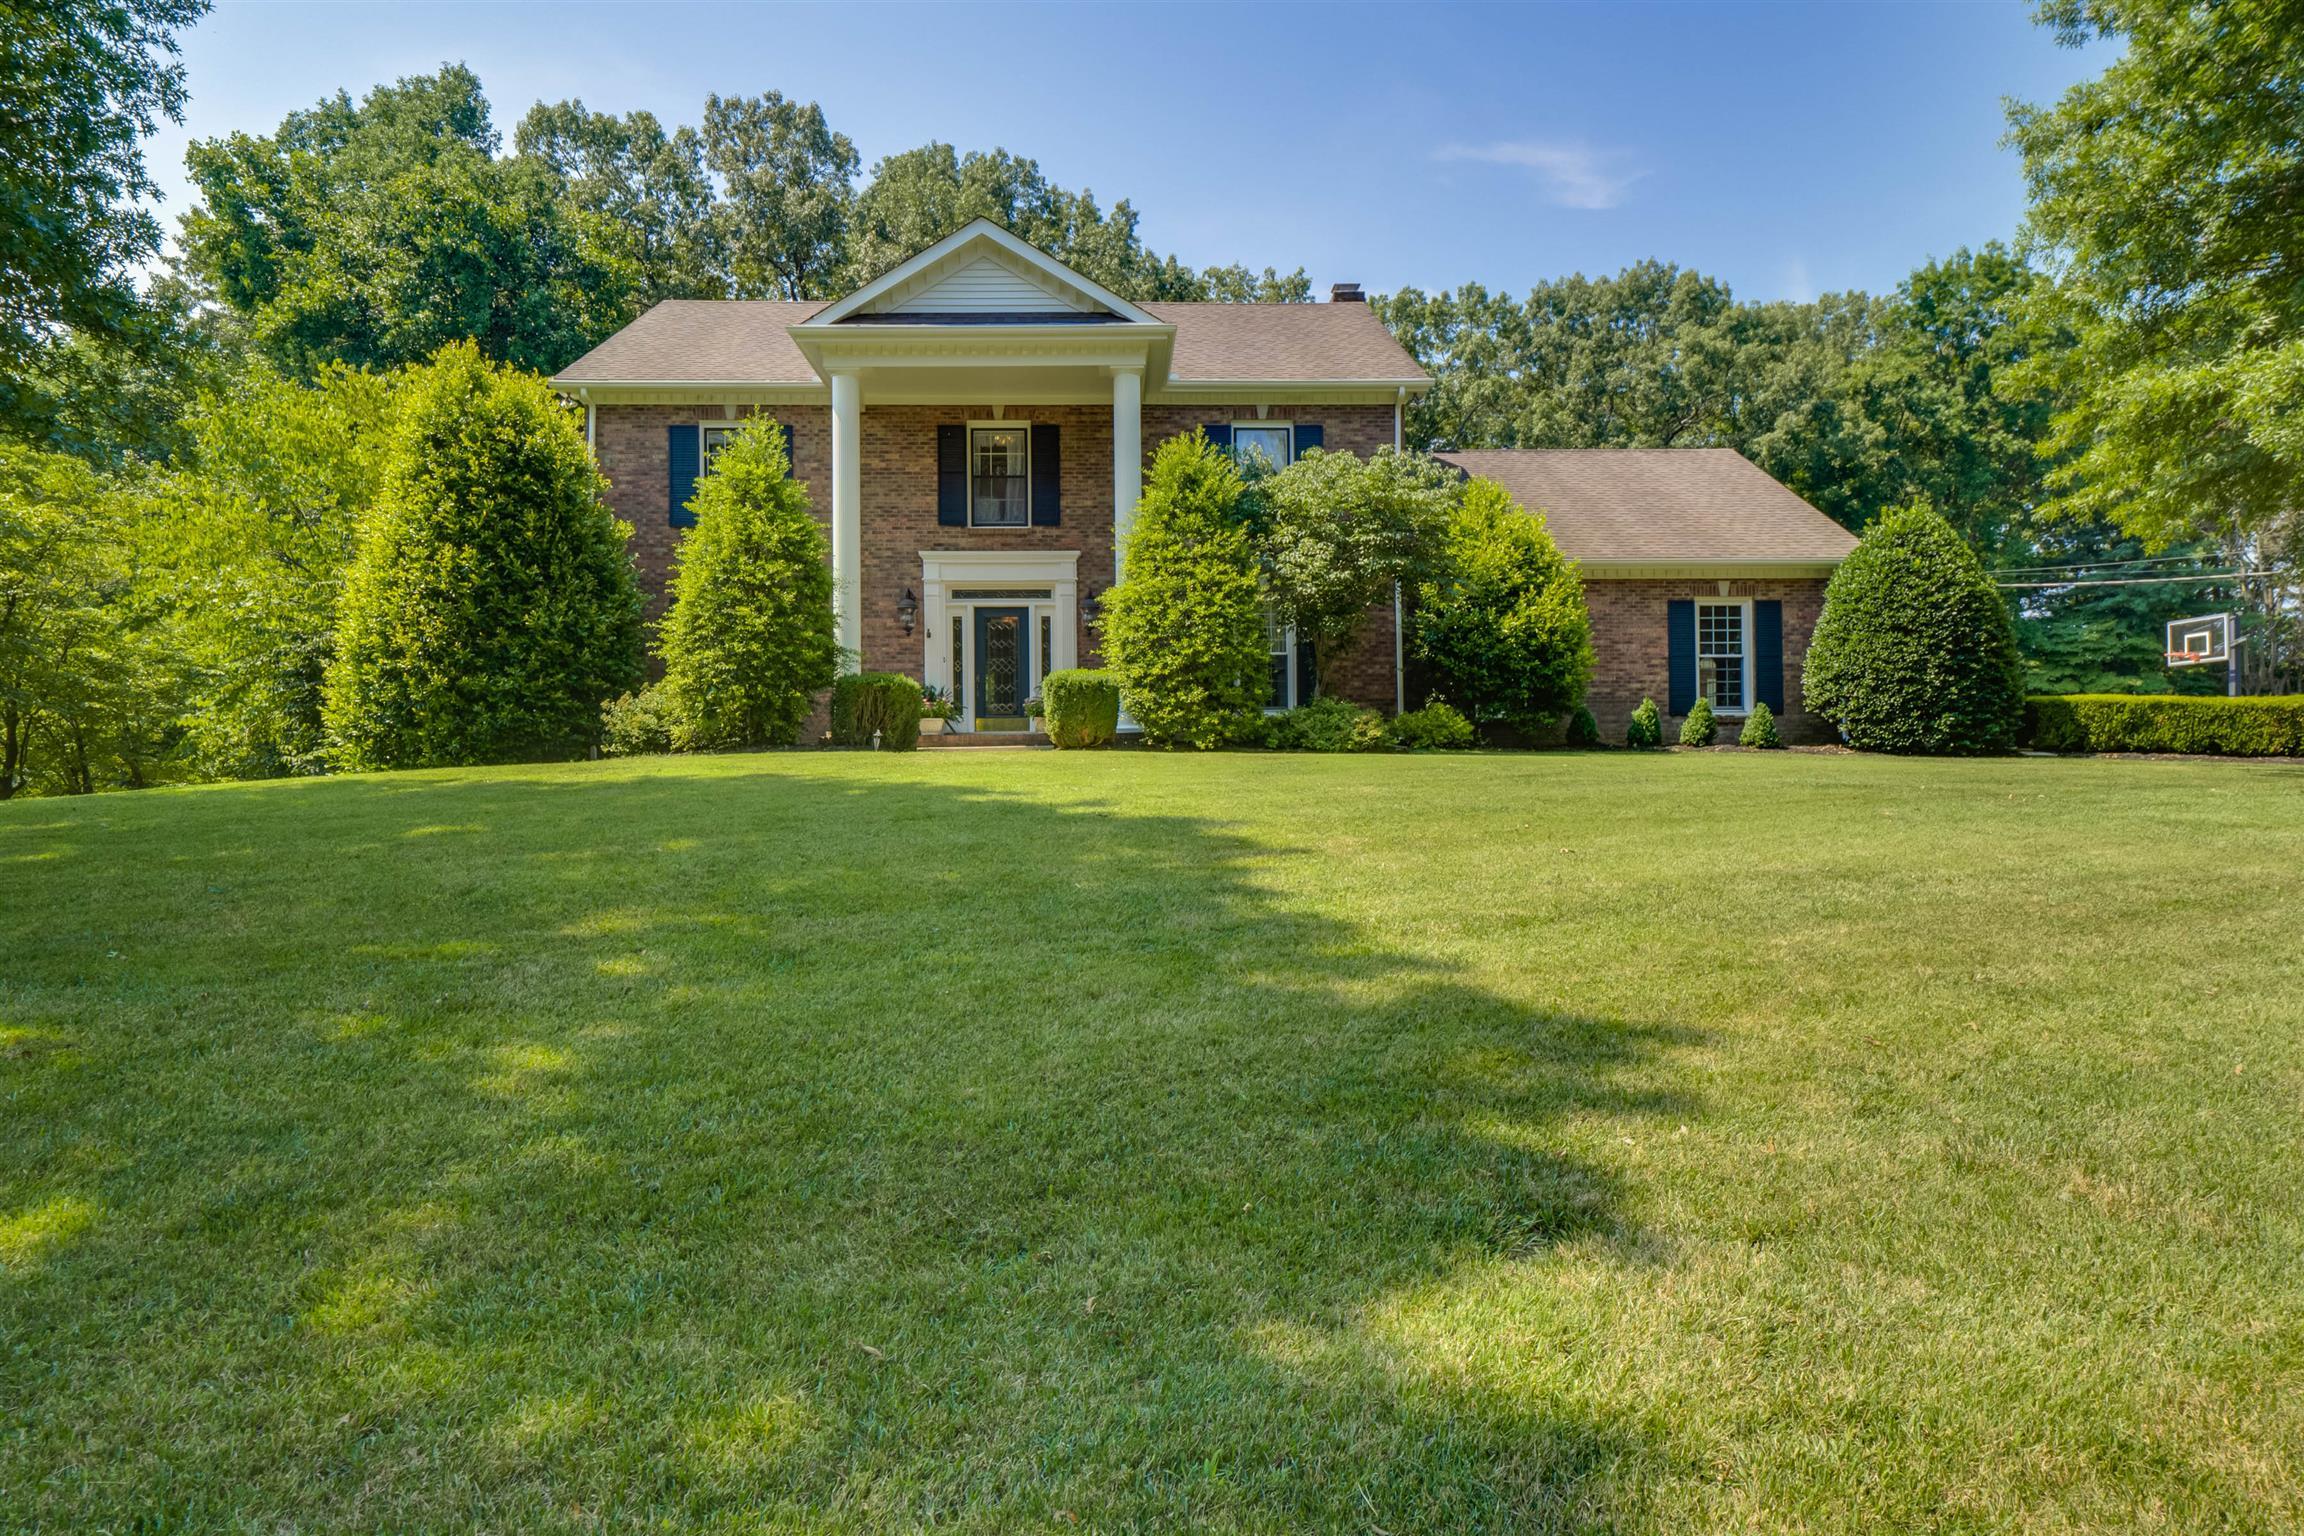 2812 Wakefield Dr, Clarksville, TN 37043 - Clarksville, TN real estate listing